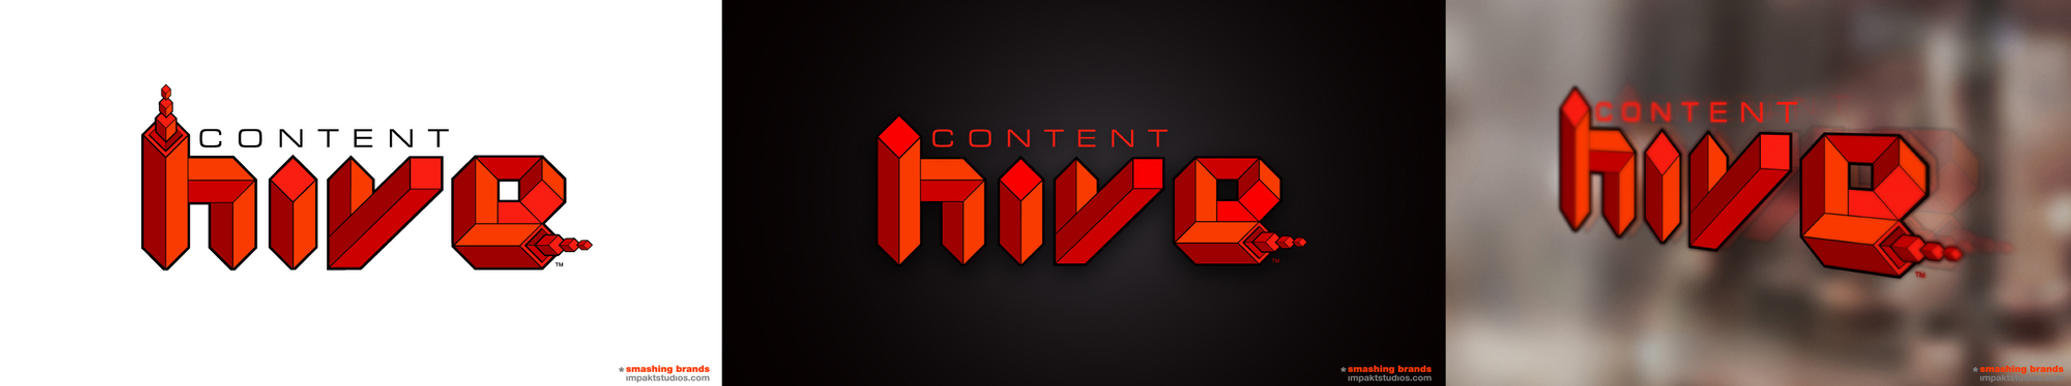 Content Hive Concept 3 by crezo